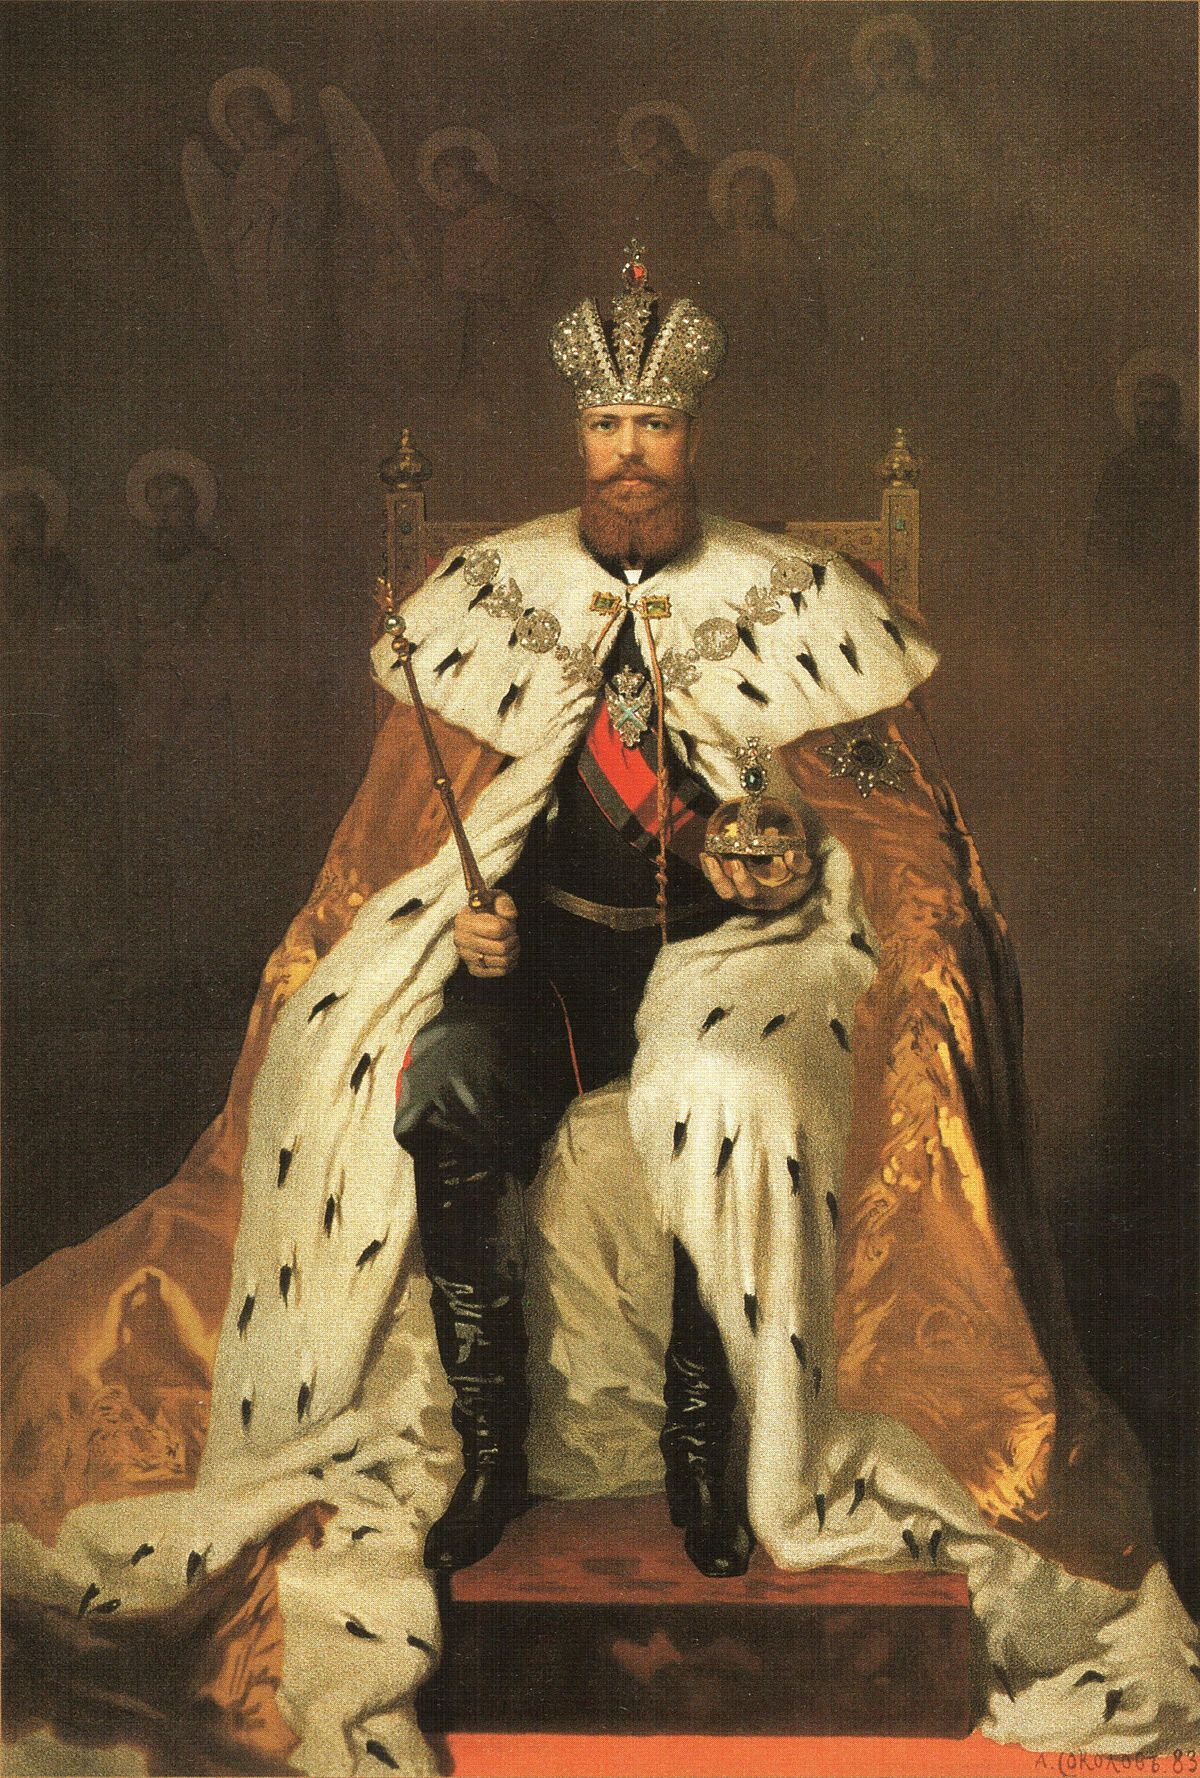 Alexander_III_of_Russia's_coronation_album_04_(Alexander_III_by_A.Sokolov)